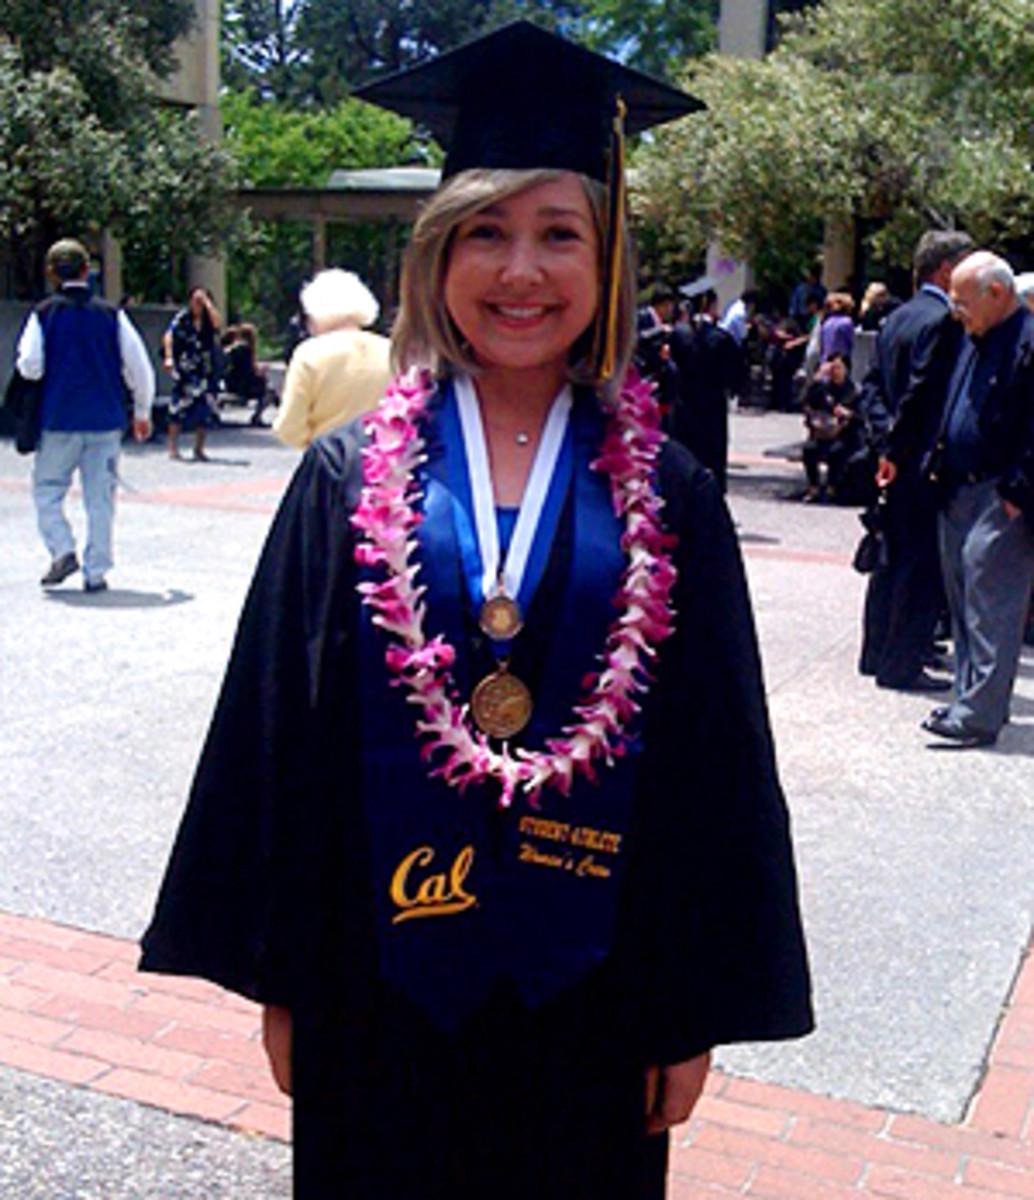 jill-costello-cal-graduation